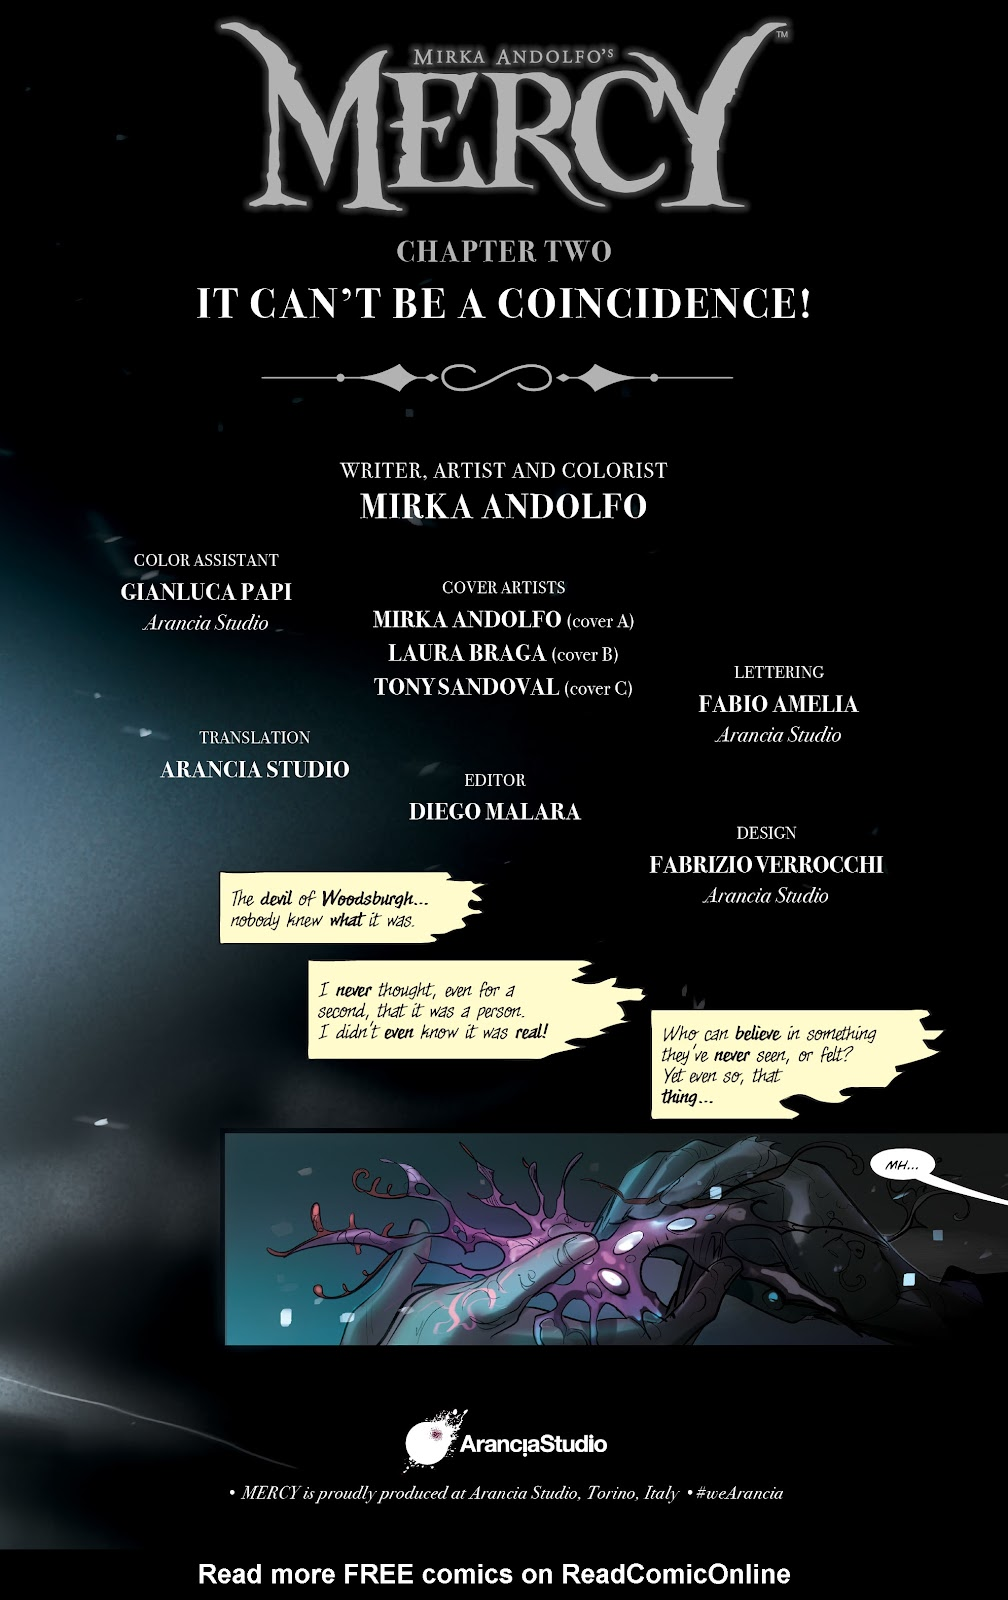 Read online Mirka Andolfo's Mercy comic -  Issue #2 - 5